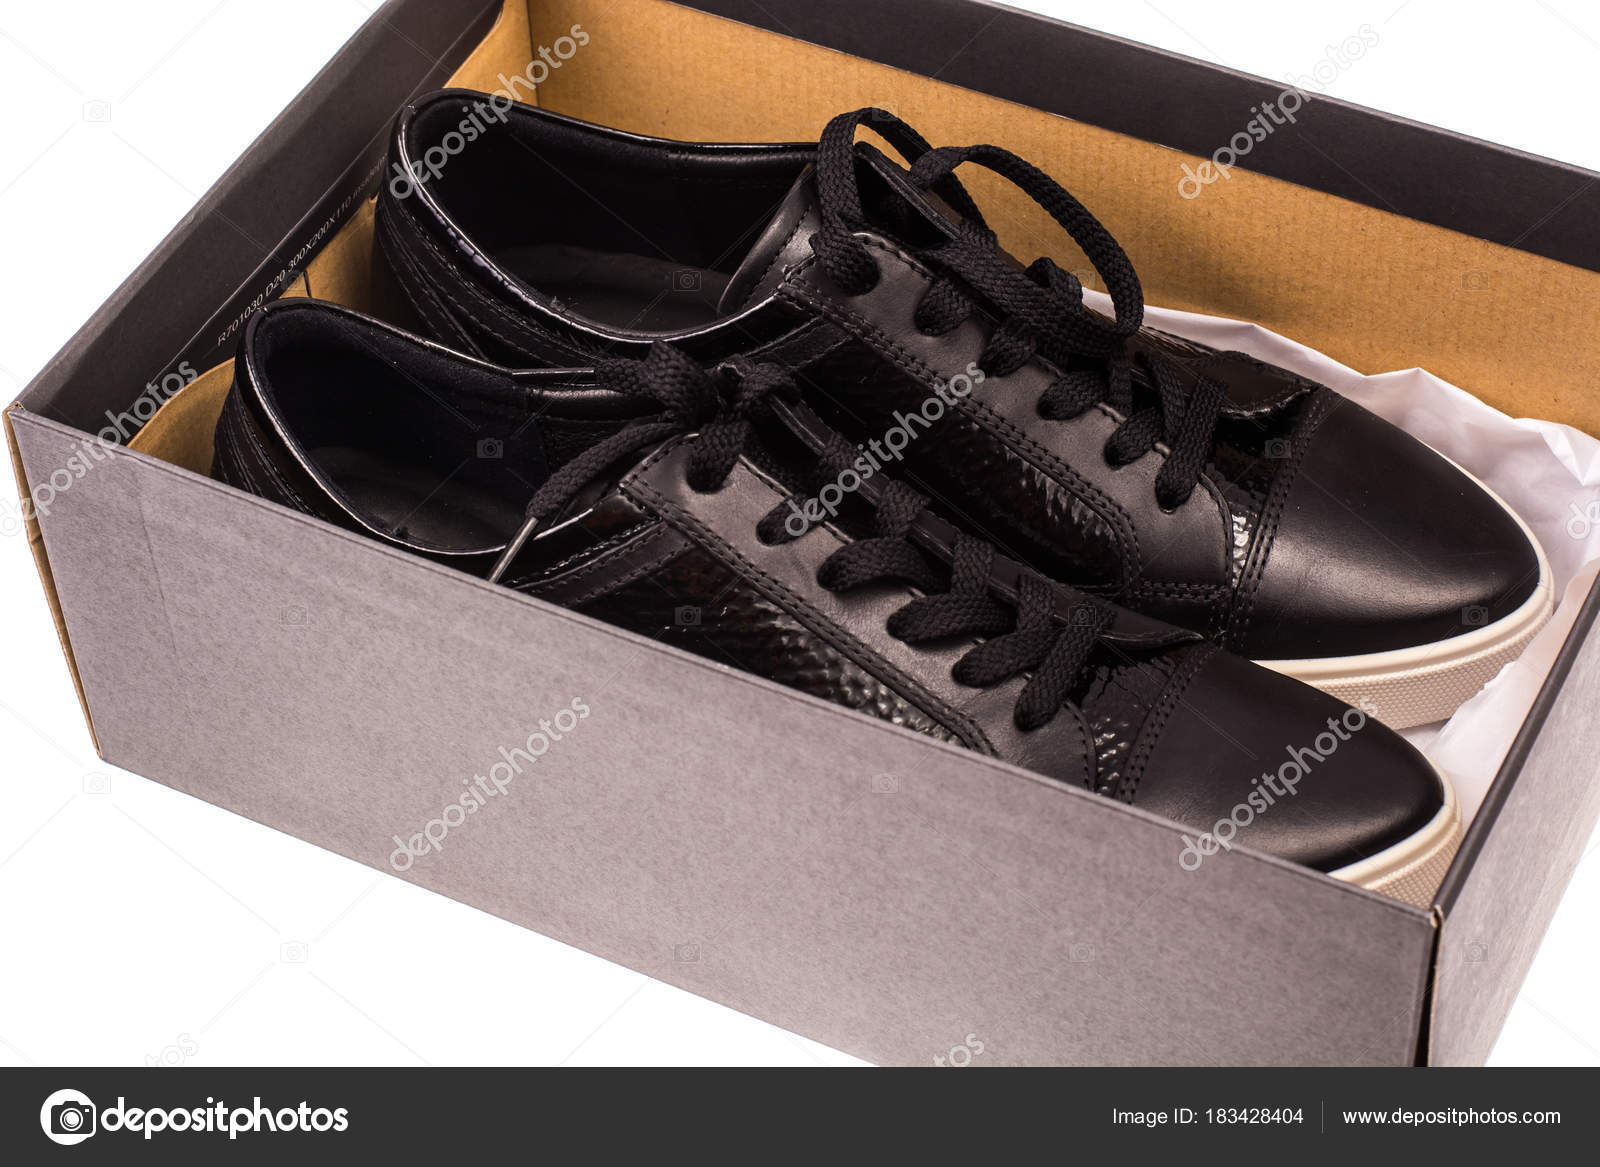 0789b4e6af7 Μαύρη γυναικεία παπούτσια με κορδόνια στα λευκά πέλματα. Στούντιο  φωτογραφίας — Εικόνα από ...